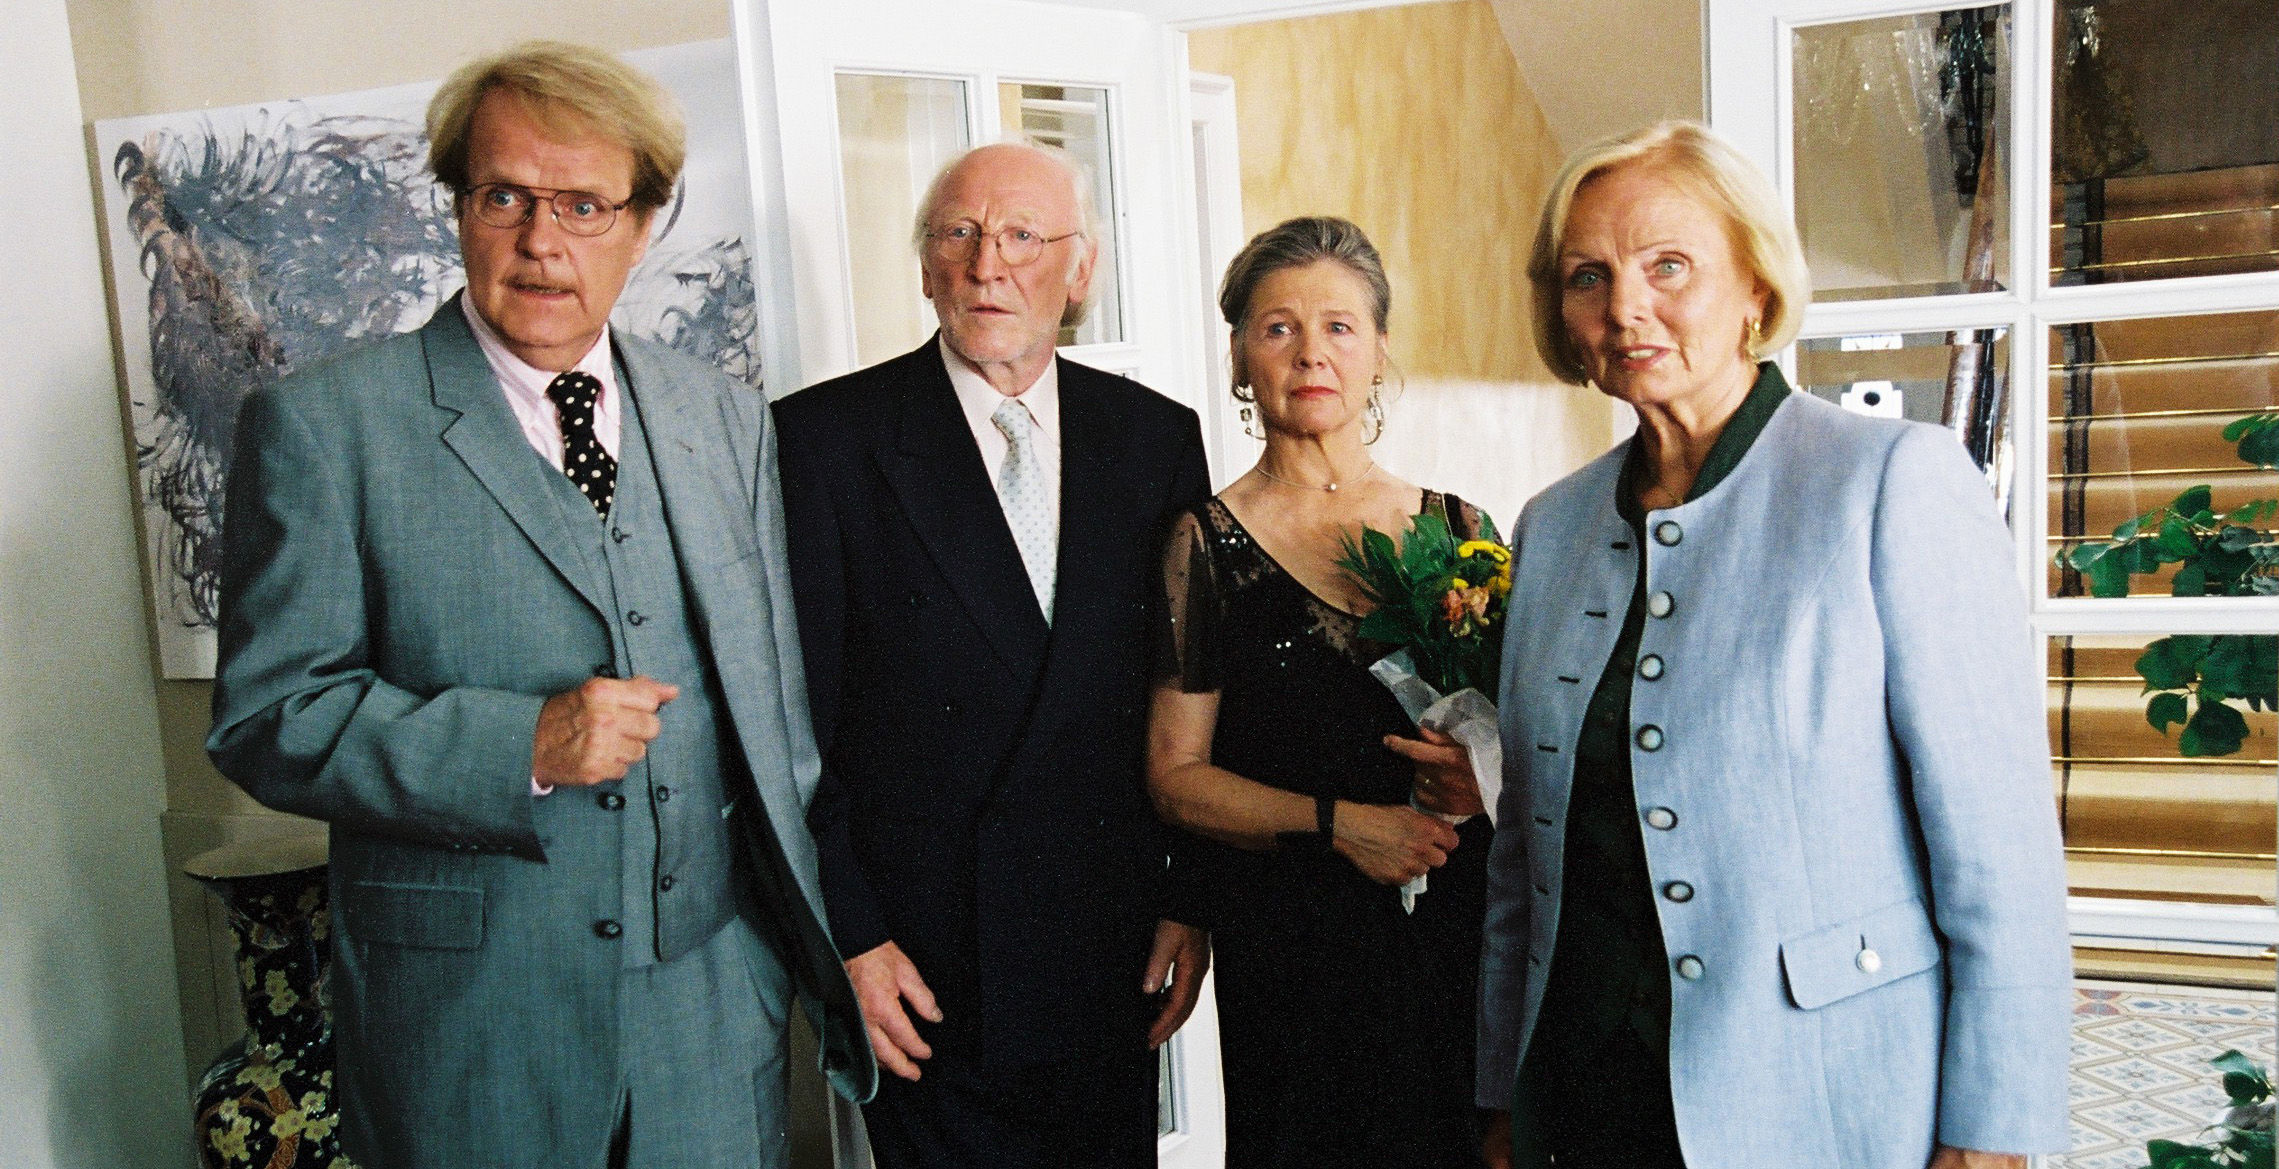 Albert (Peter Fricke), Paul (Karl Merkatz), Sandra (Helma Gautier), Jacqueline (Ruth Maria Kubitschek)